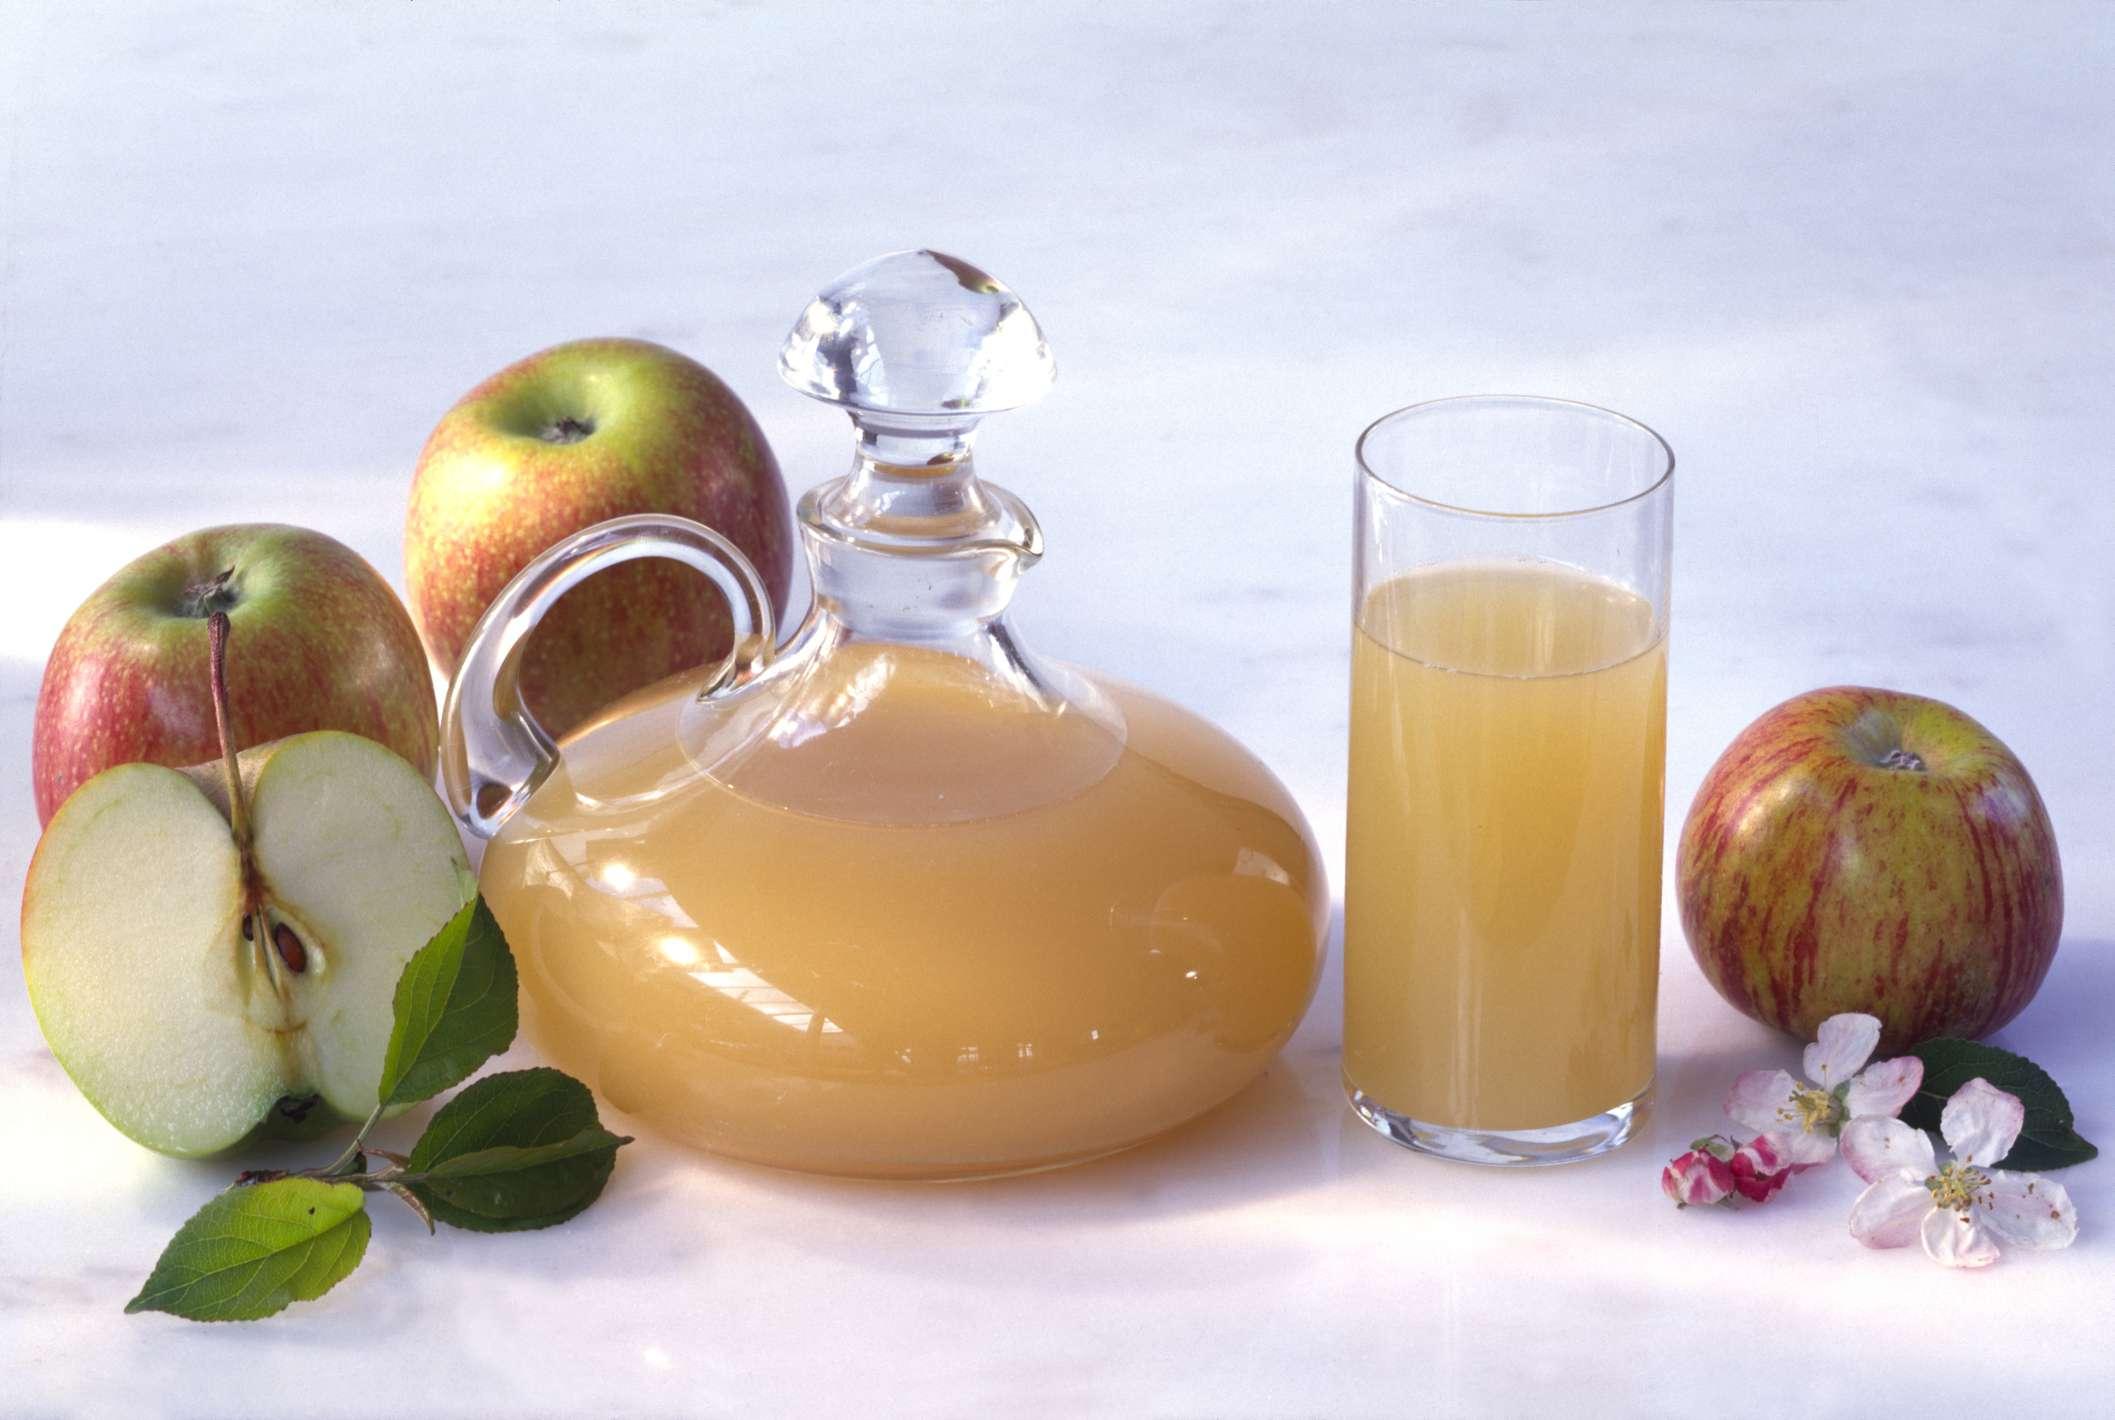 Apple cider vinegar fire tonic